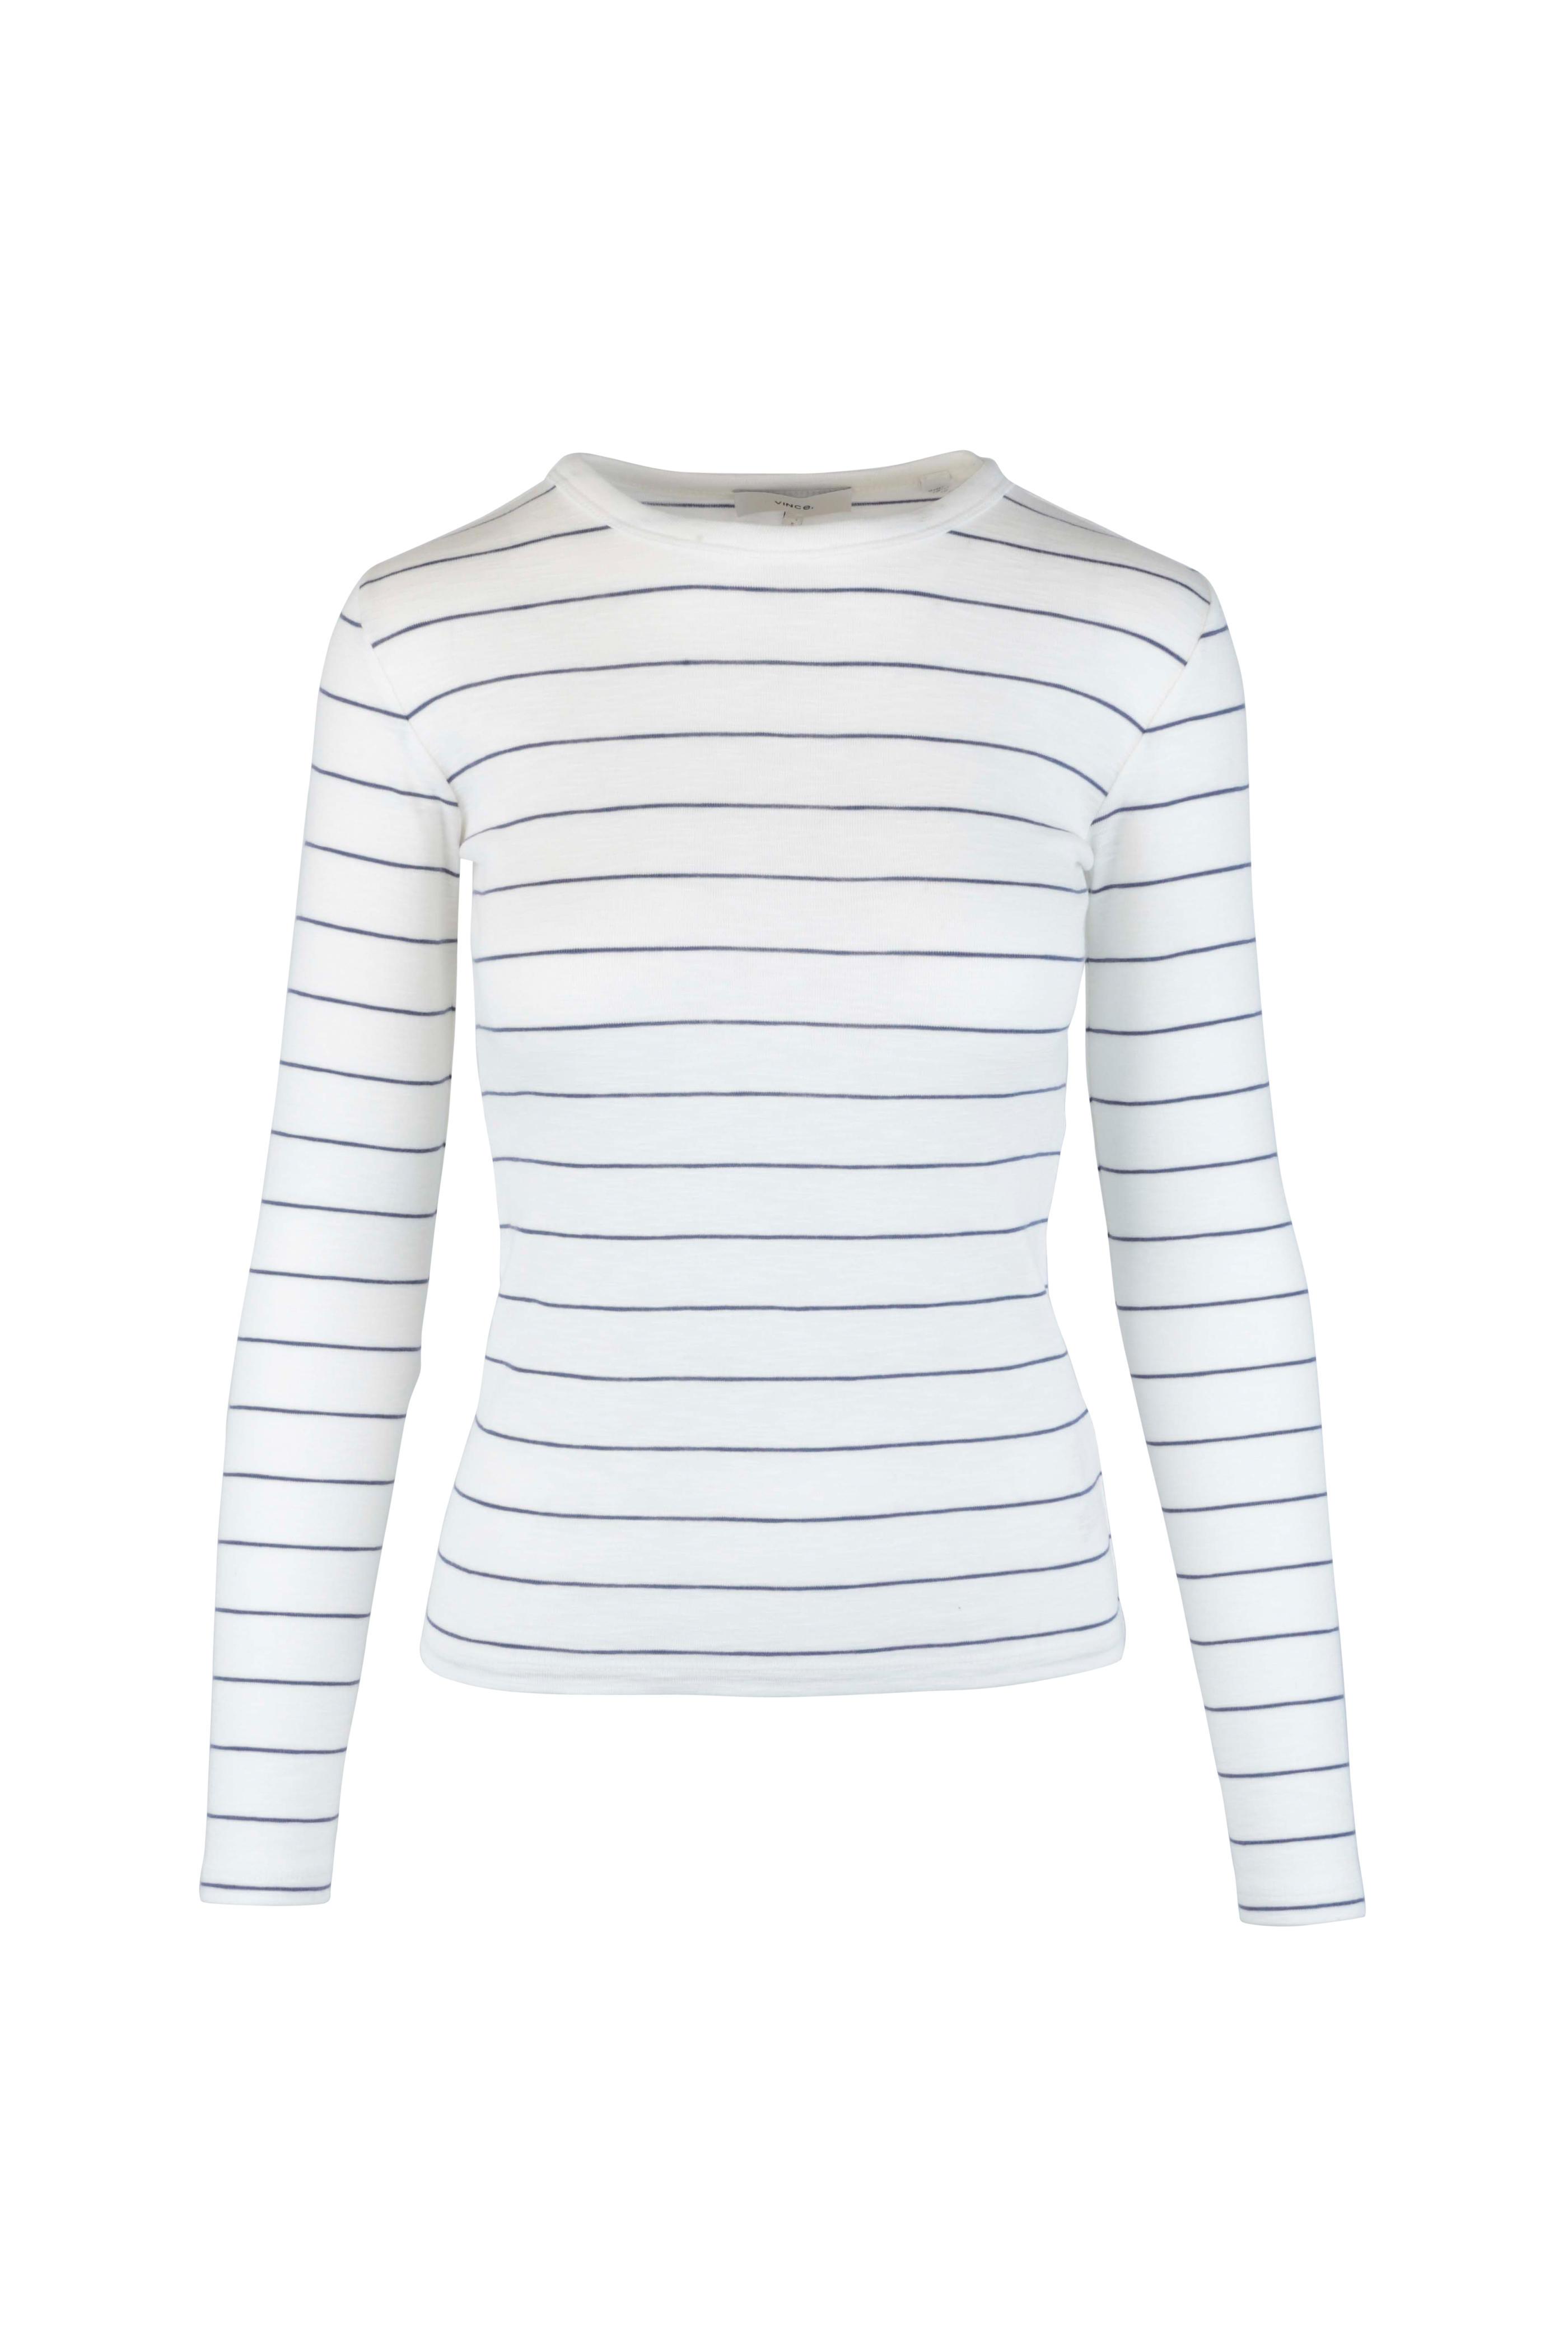 c2051c50b2 Blue And White Striped Long Sleeve T Shirt - DREAMWORKS